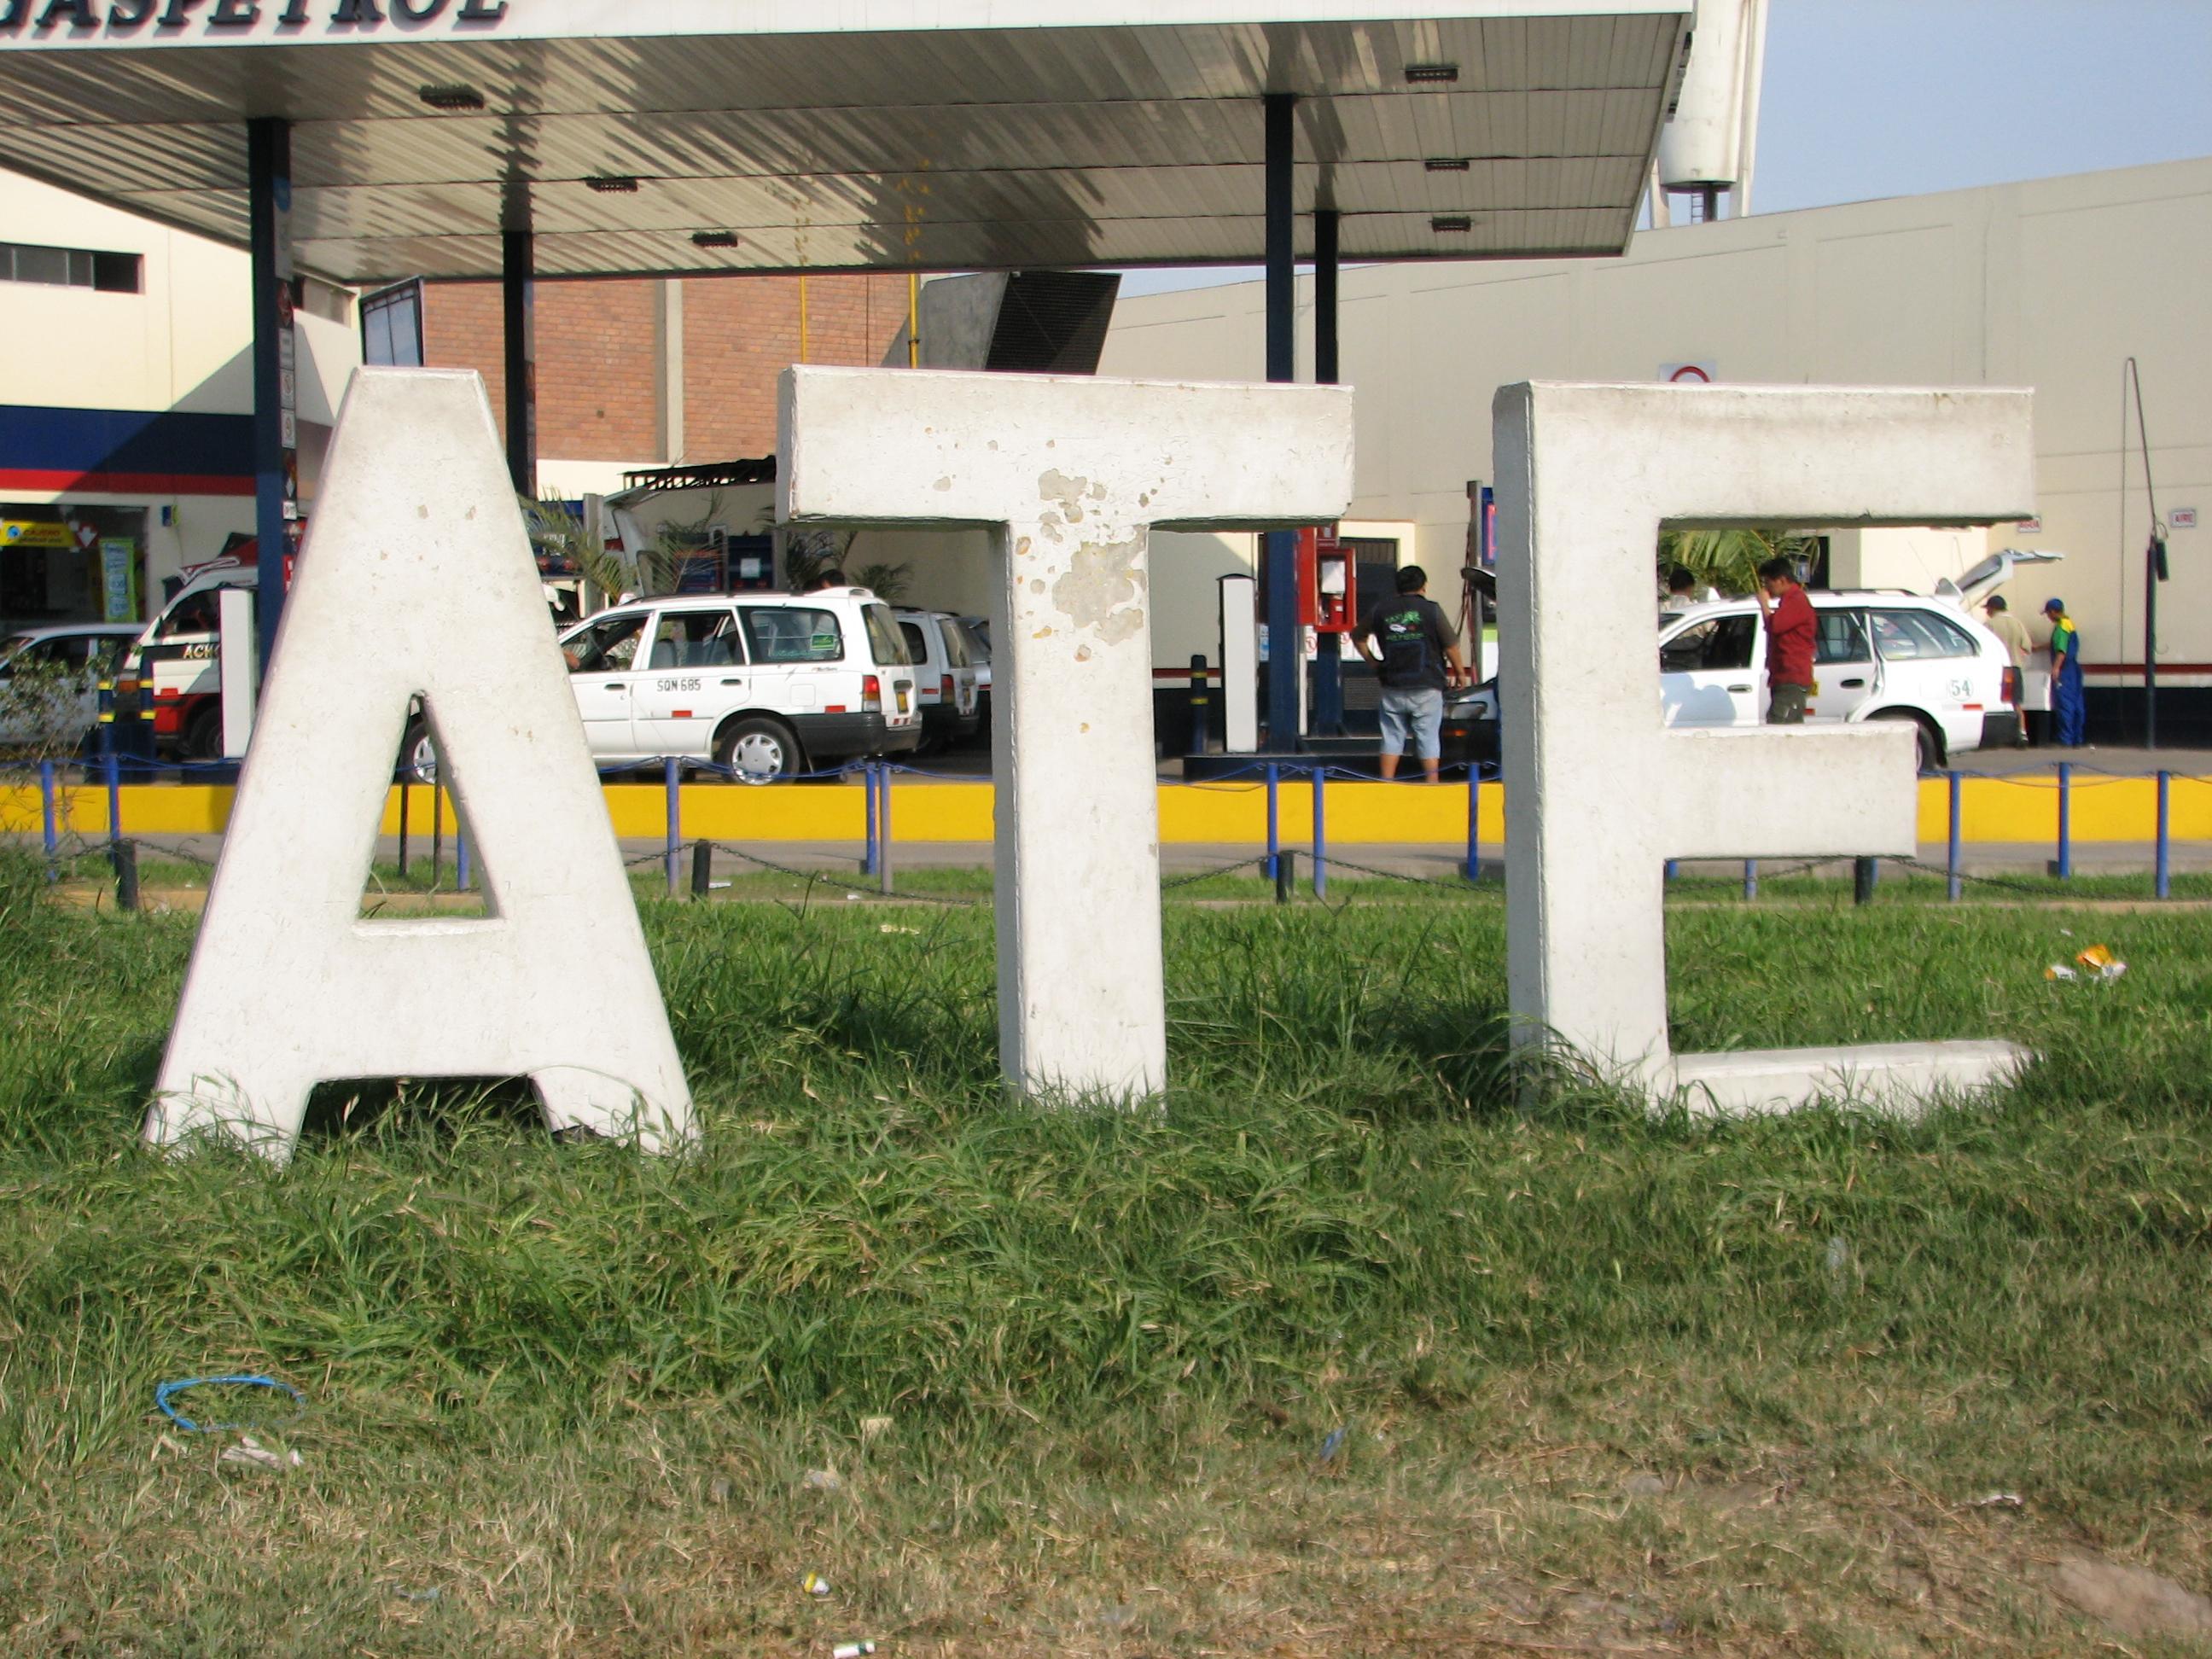 District_sign_Peru_Lima_Ate.jpg